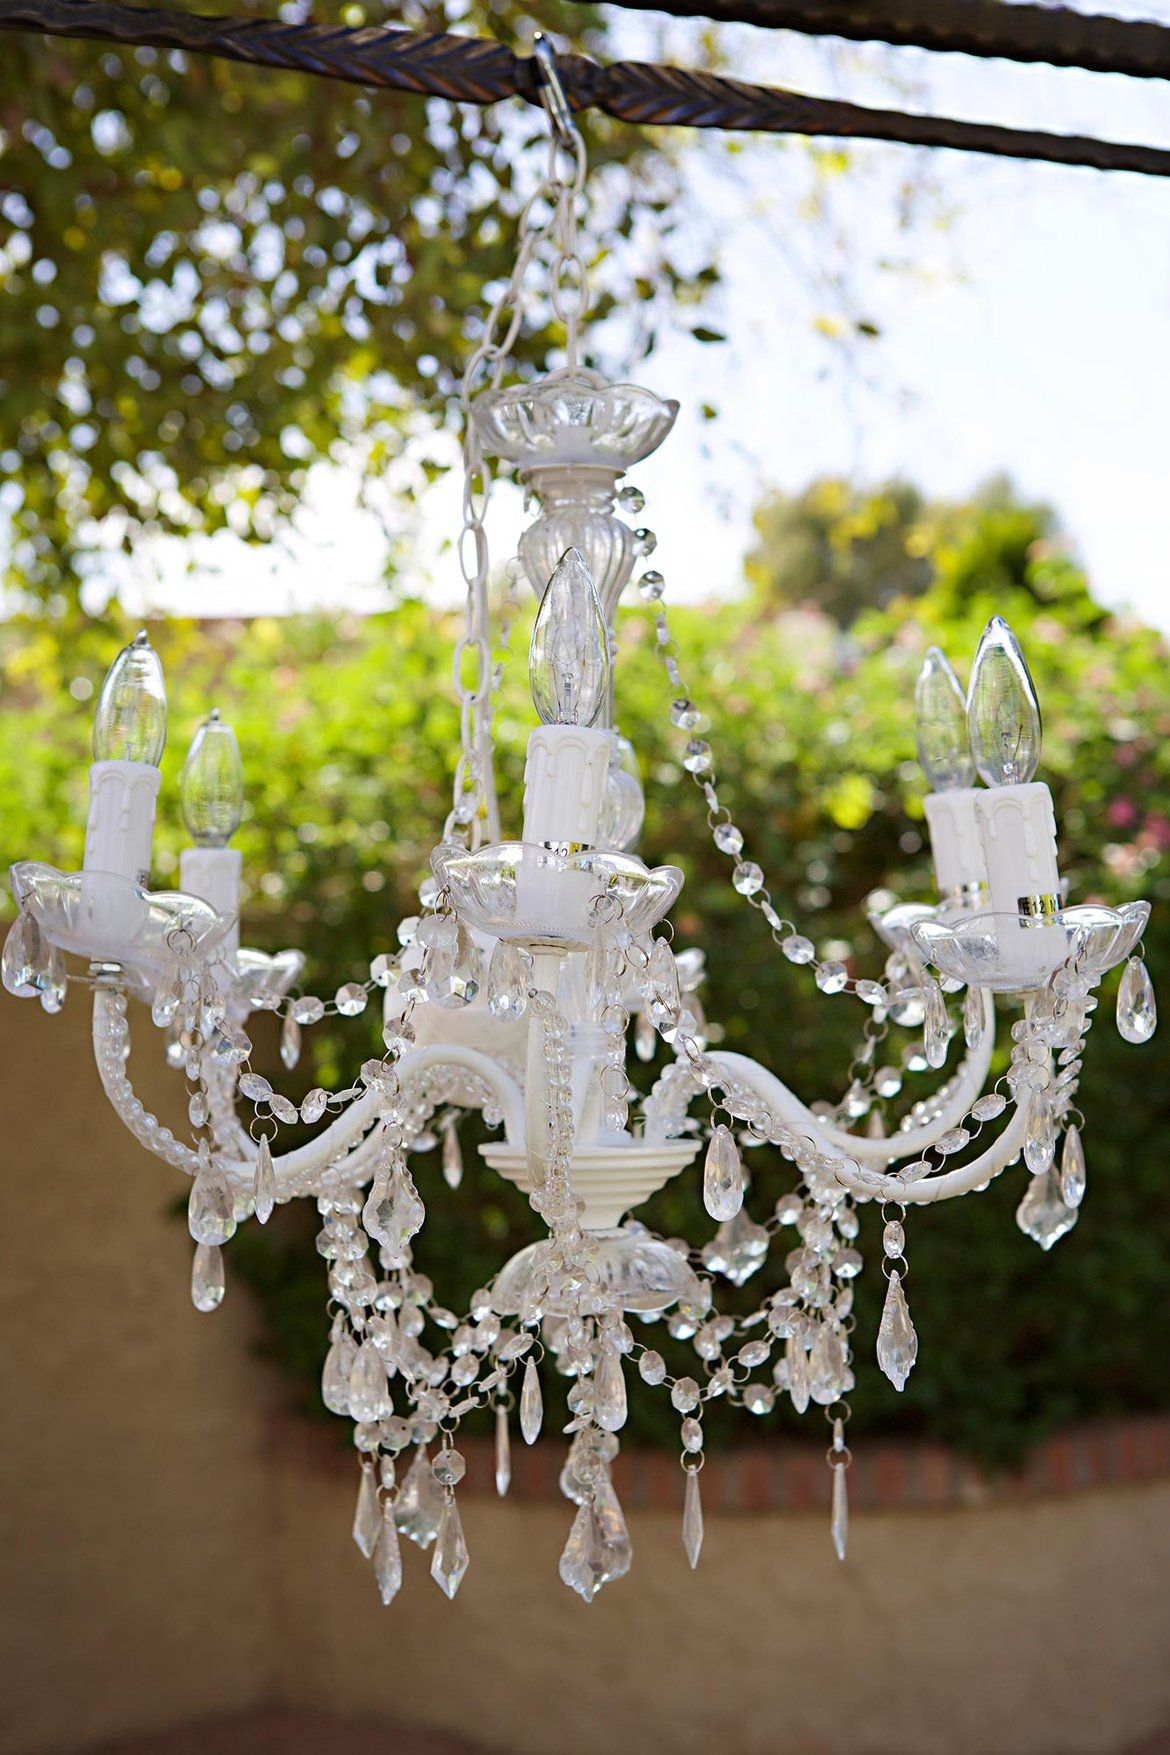 backyard wedding noise ordinance backyard wedding. Black Bedroom Furniture Sets. Home Design Ideas